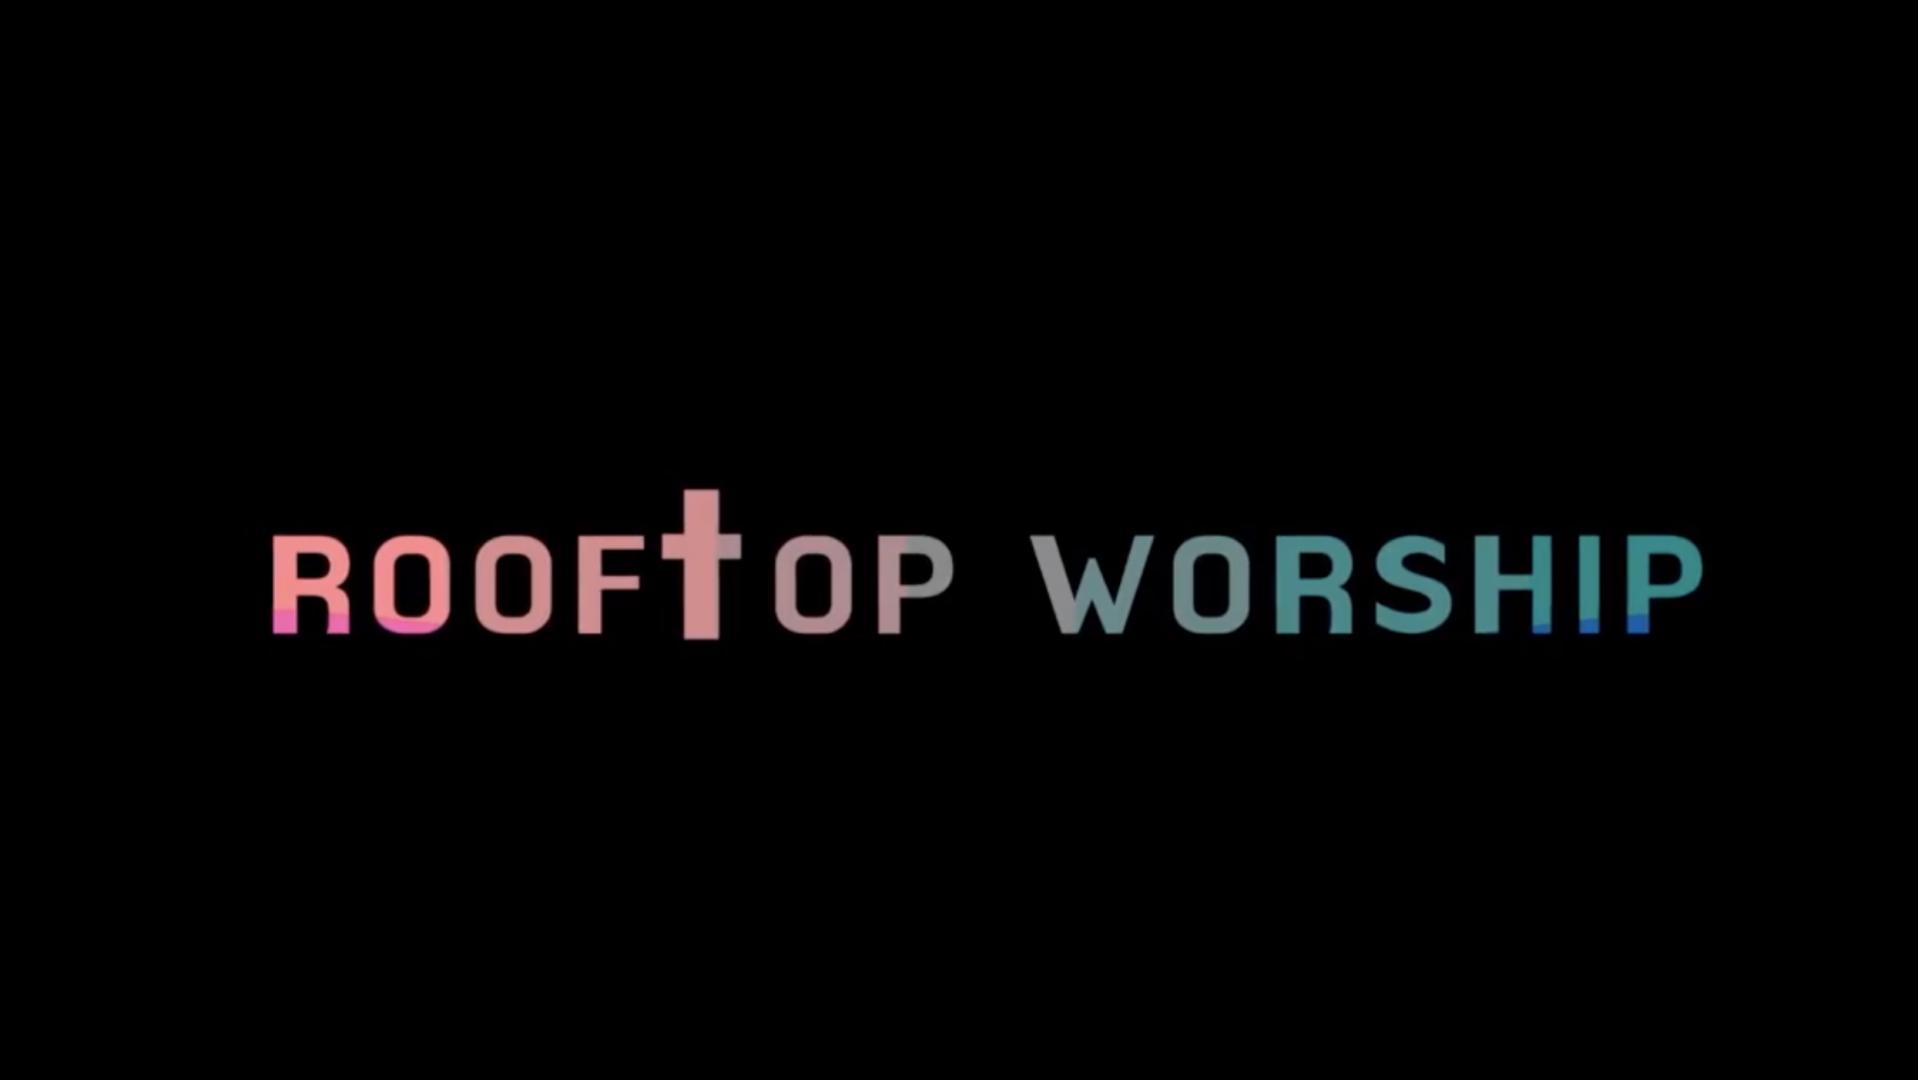 [M2] Rooftop Worship